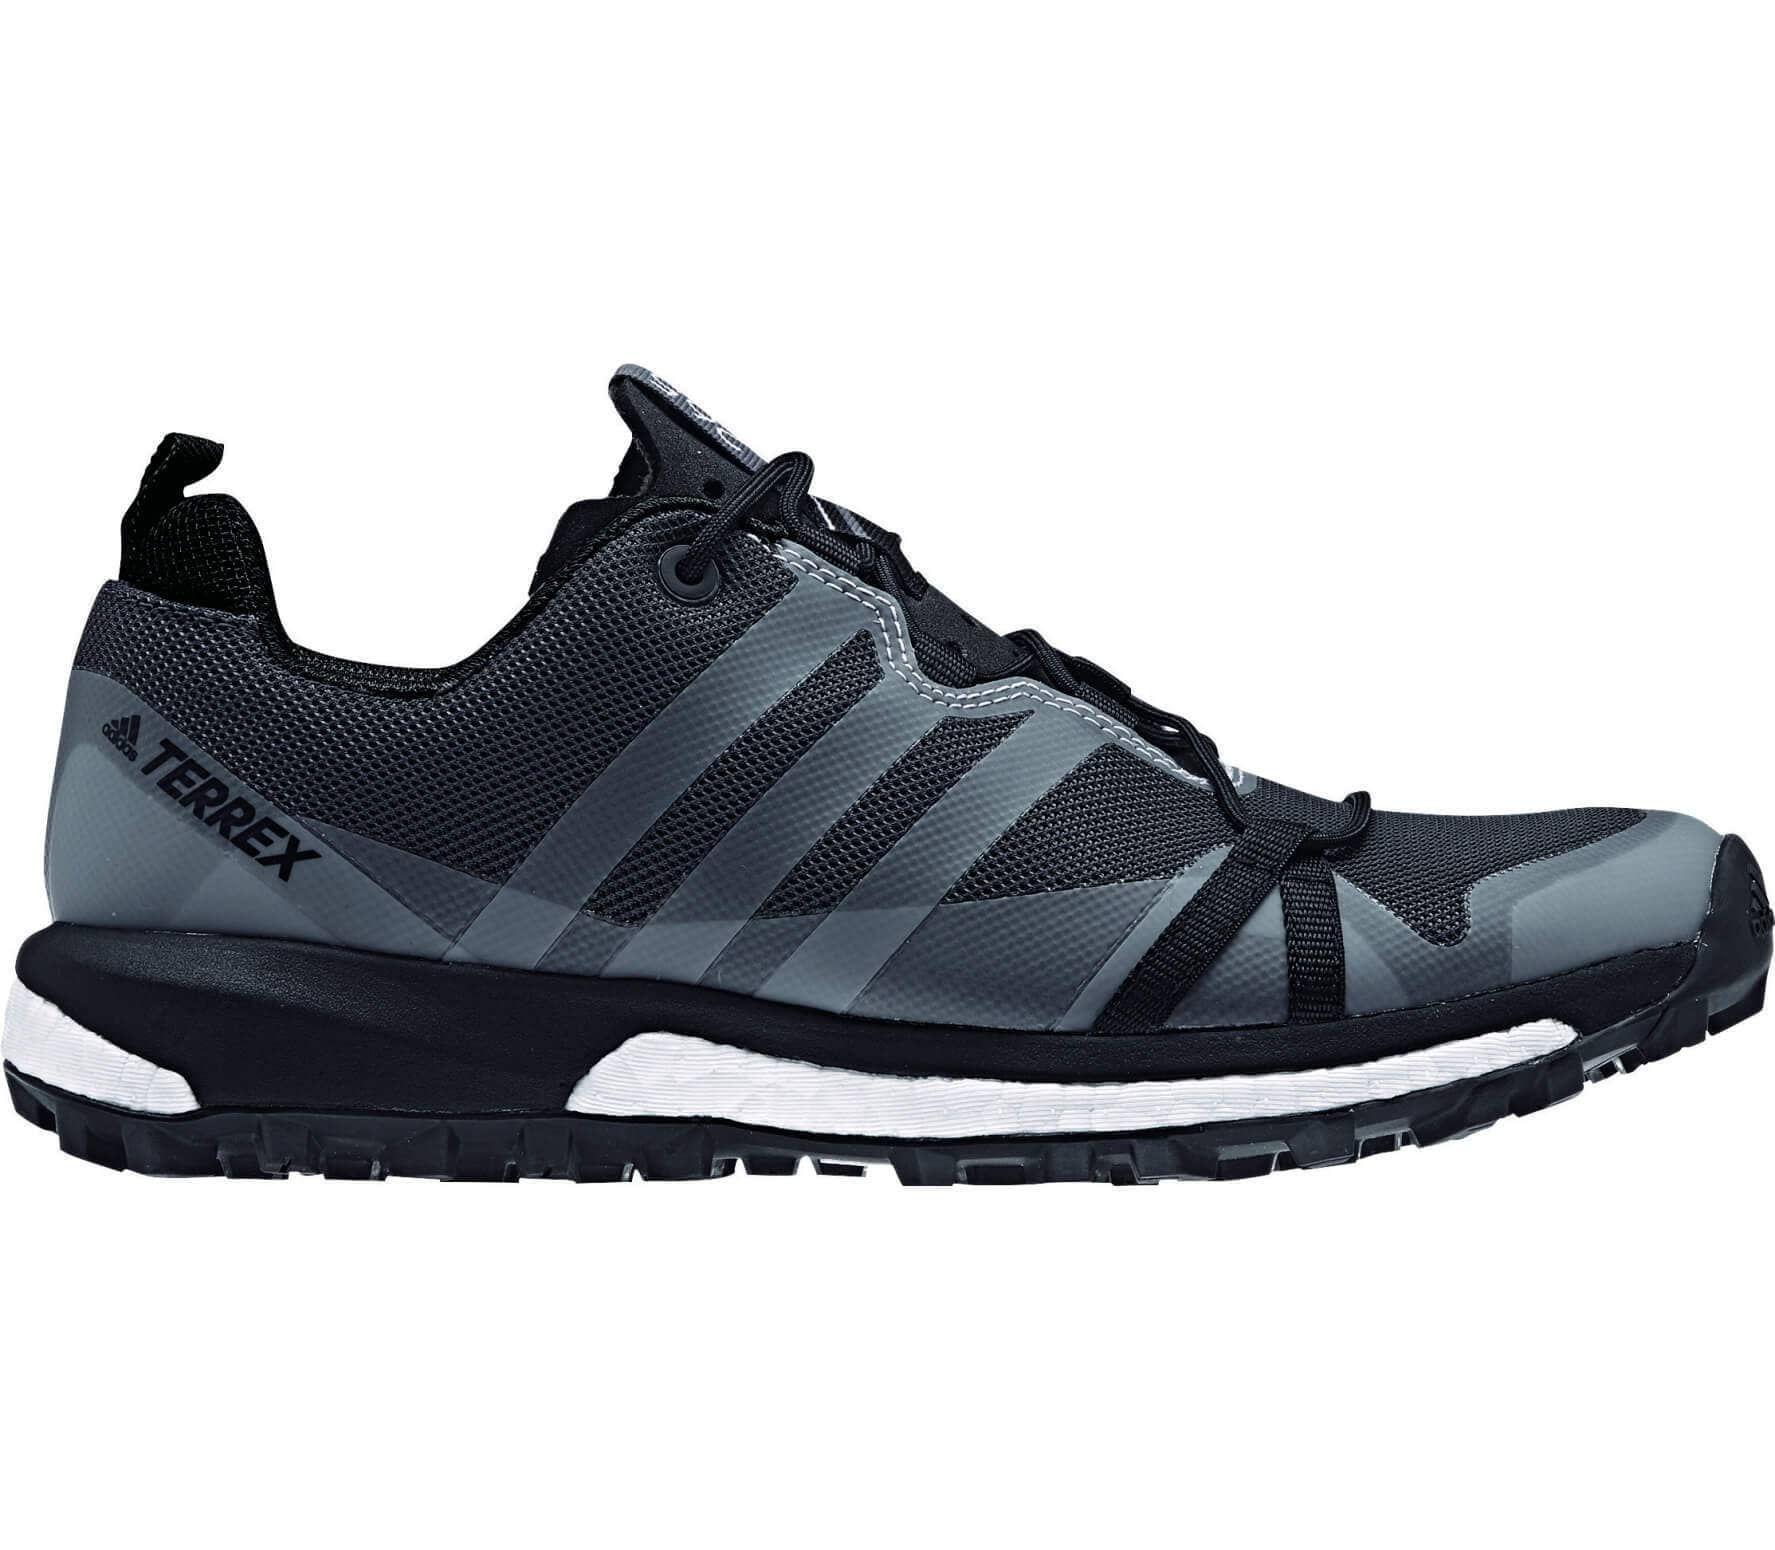 quality design af3e3 c28b0 Adidas - Terrex Agravic womens Mountain running shoes (blackgrey)